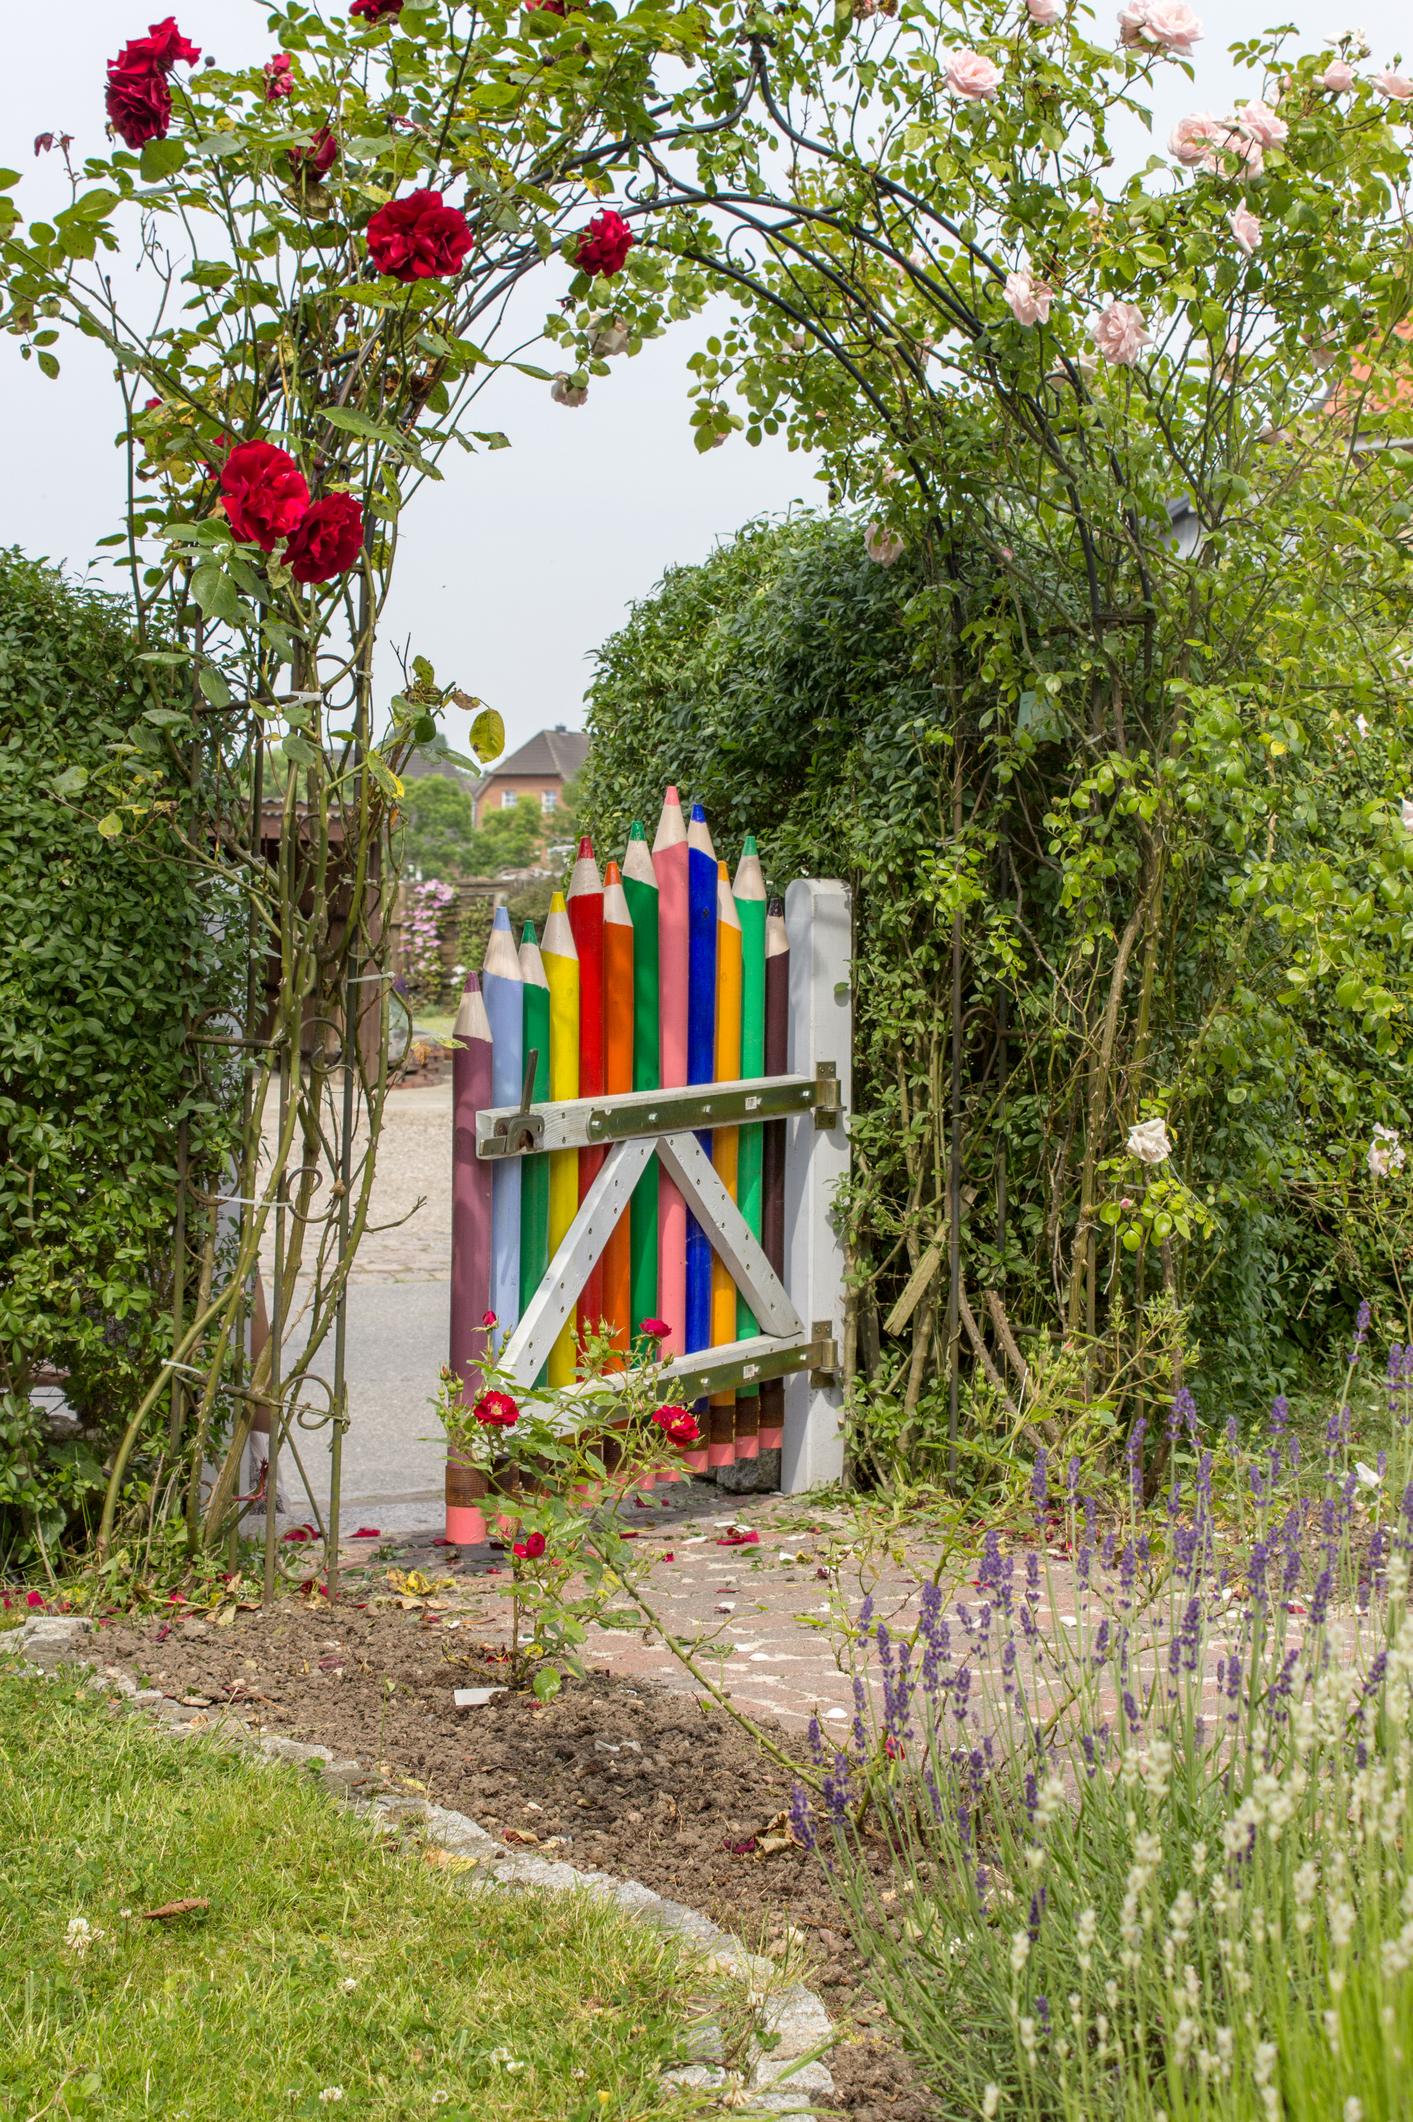 Pencil Fence / Pencil Gate - Gorgeous Garden